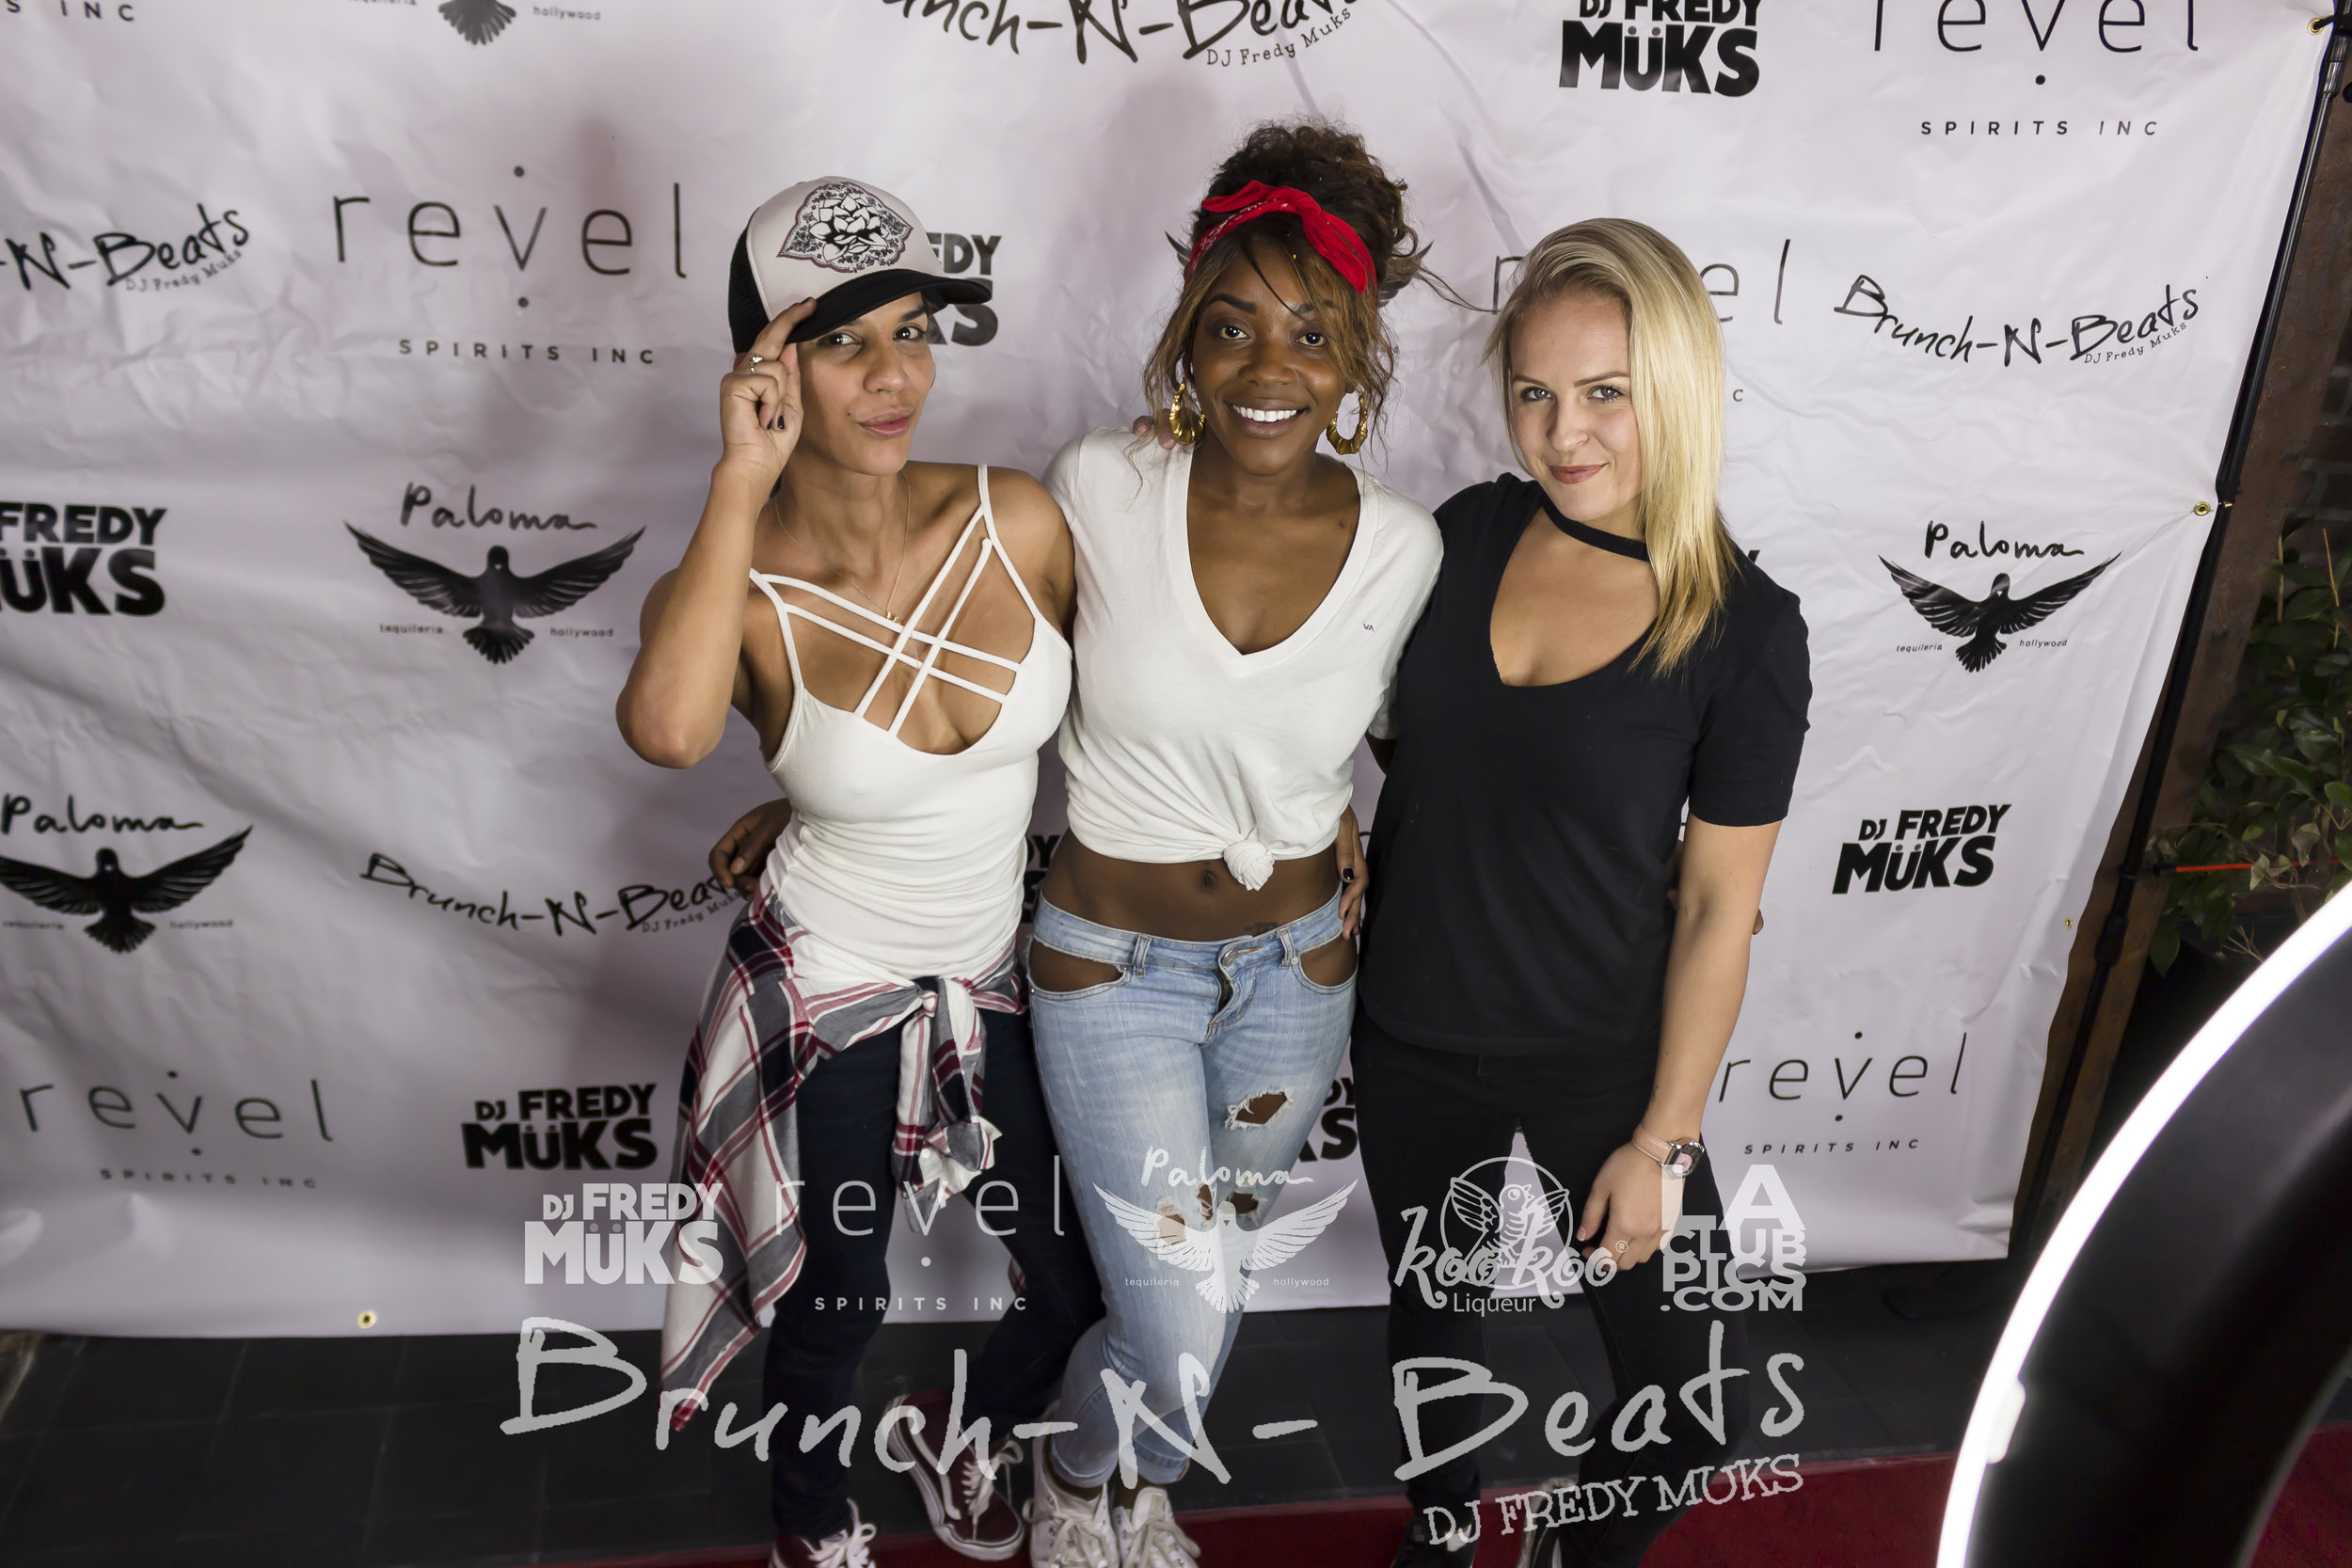 Brunch-N-Beats - 03-11-18_85.jpg